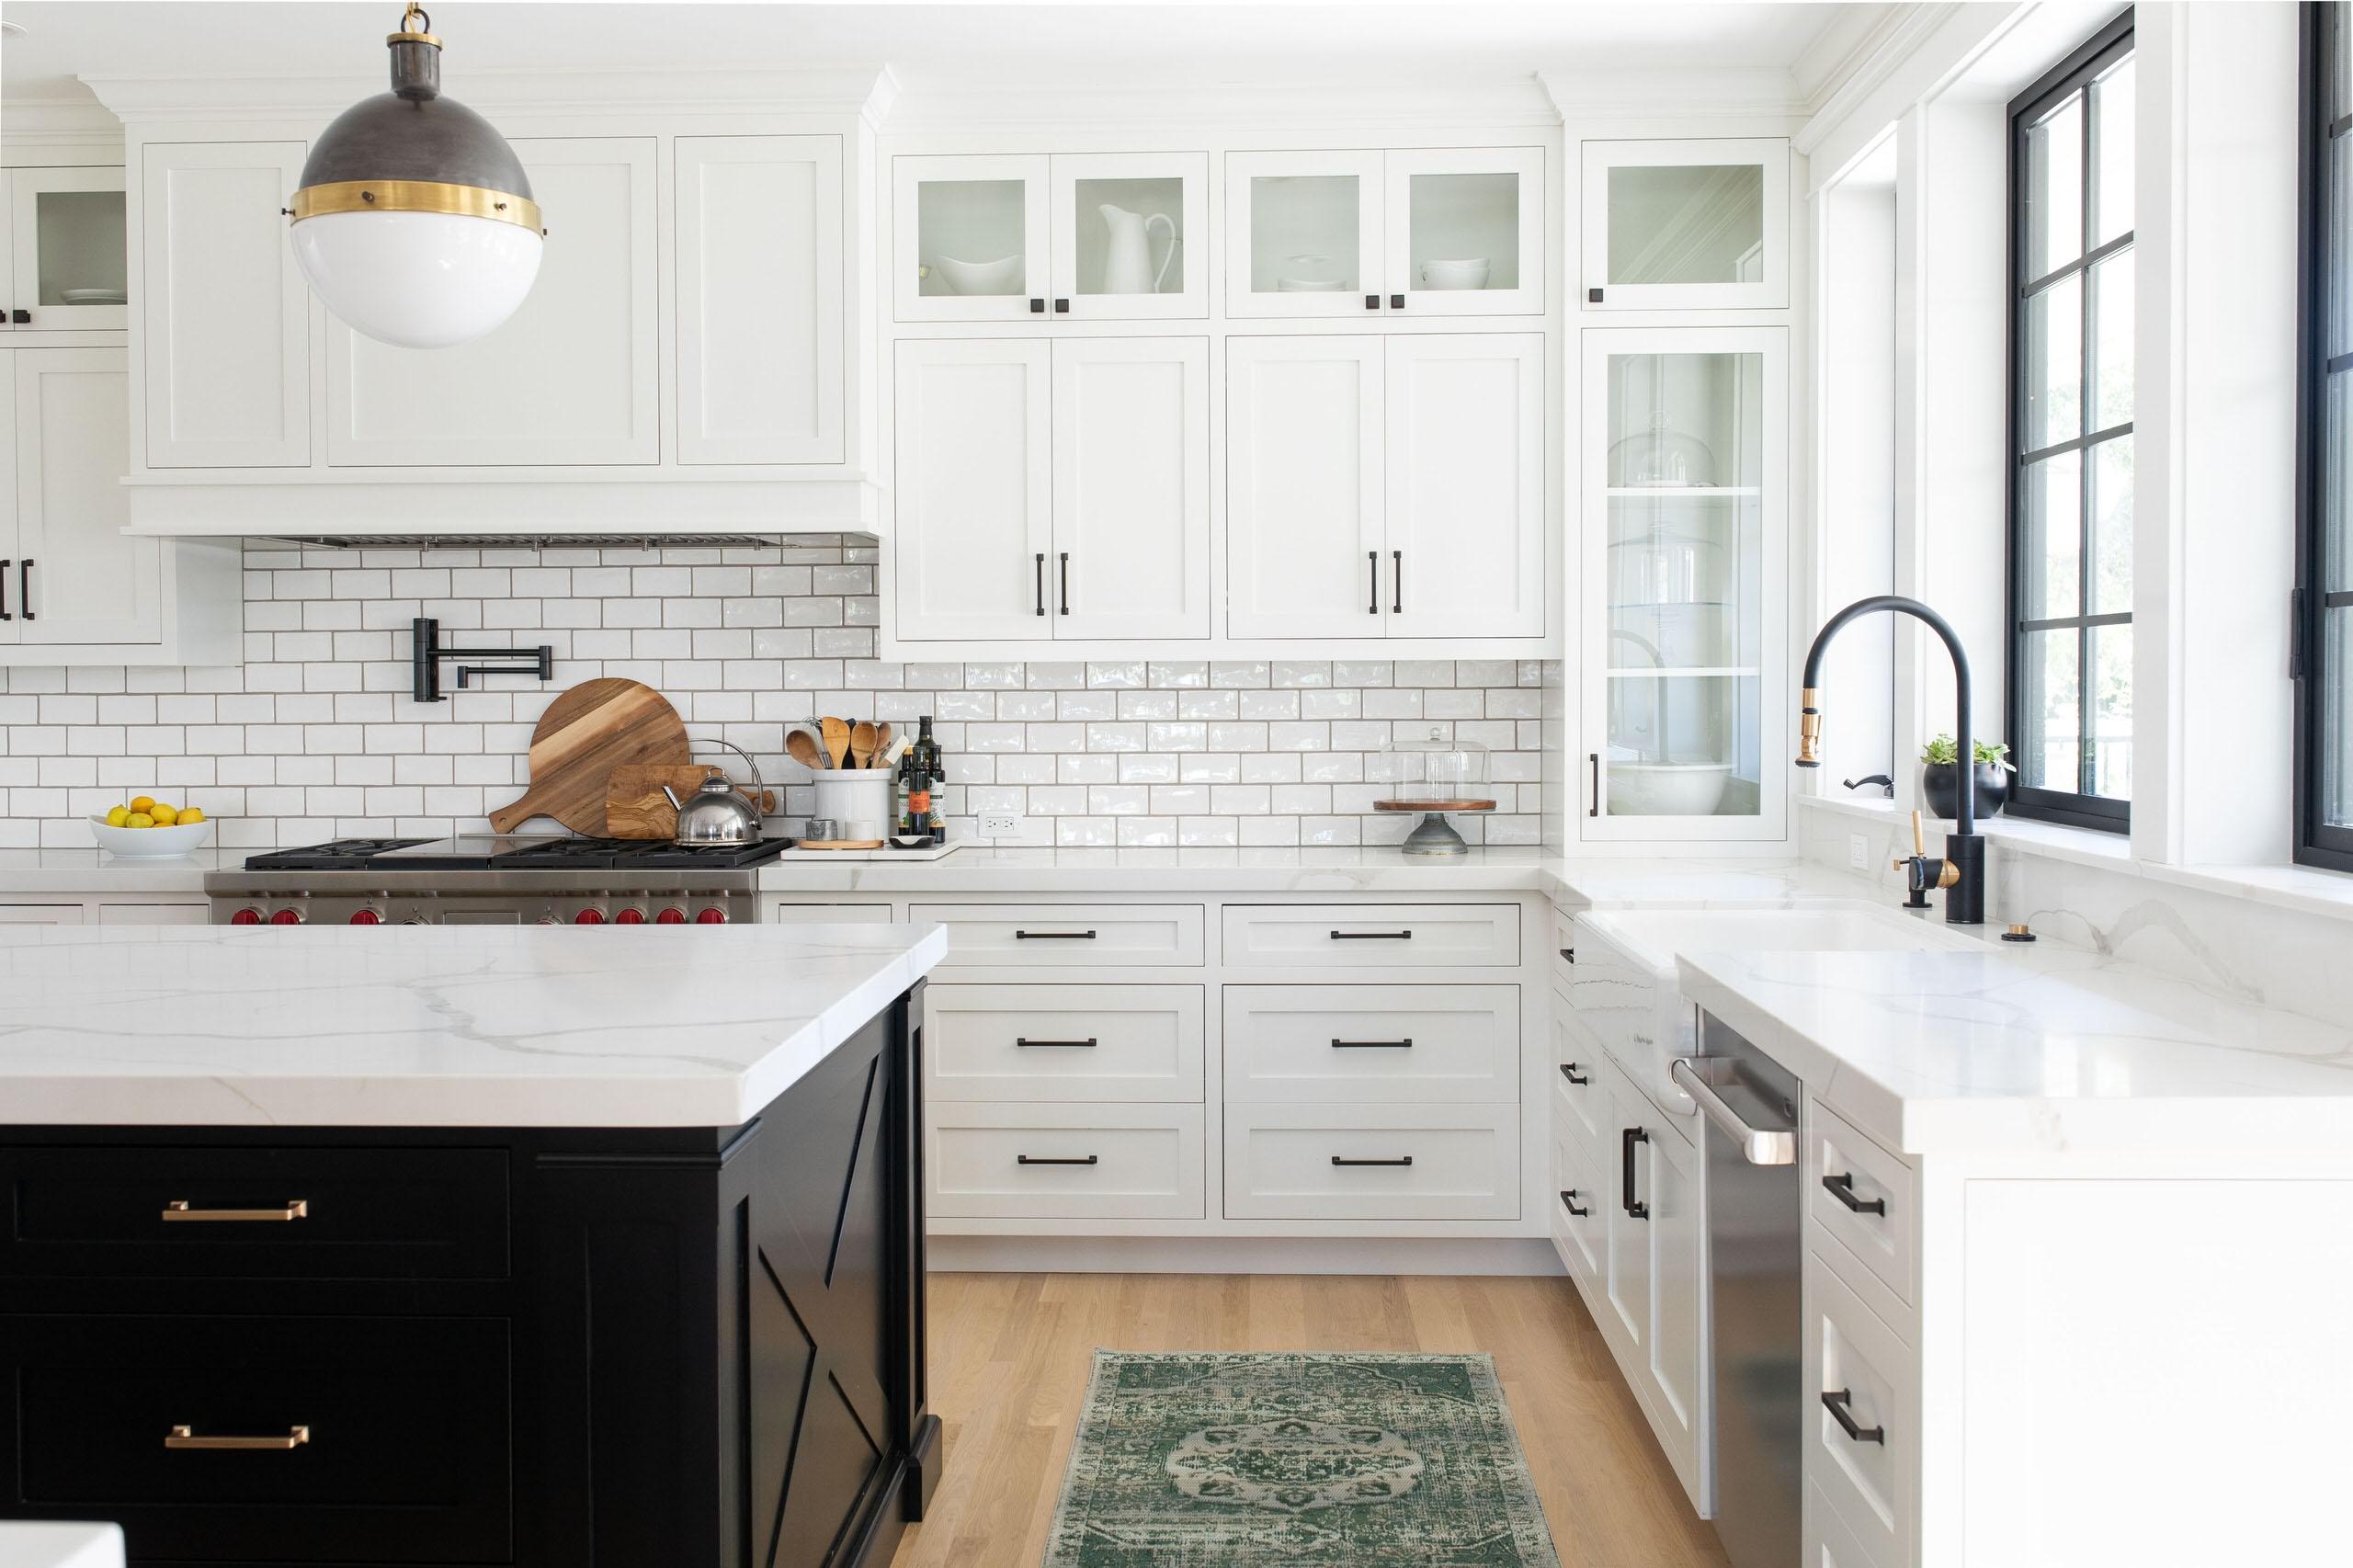 Image of: 75 Beautiful Farmhouse Kitchen With Subway Tile Backsplash Pictures Ideas November 2020 Houzz